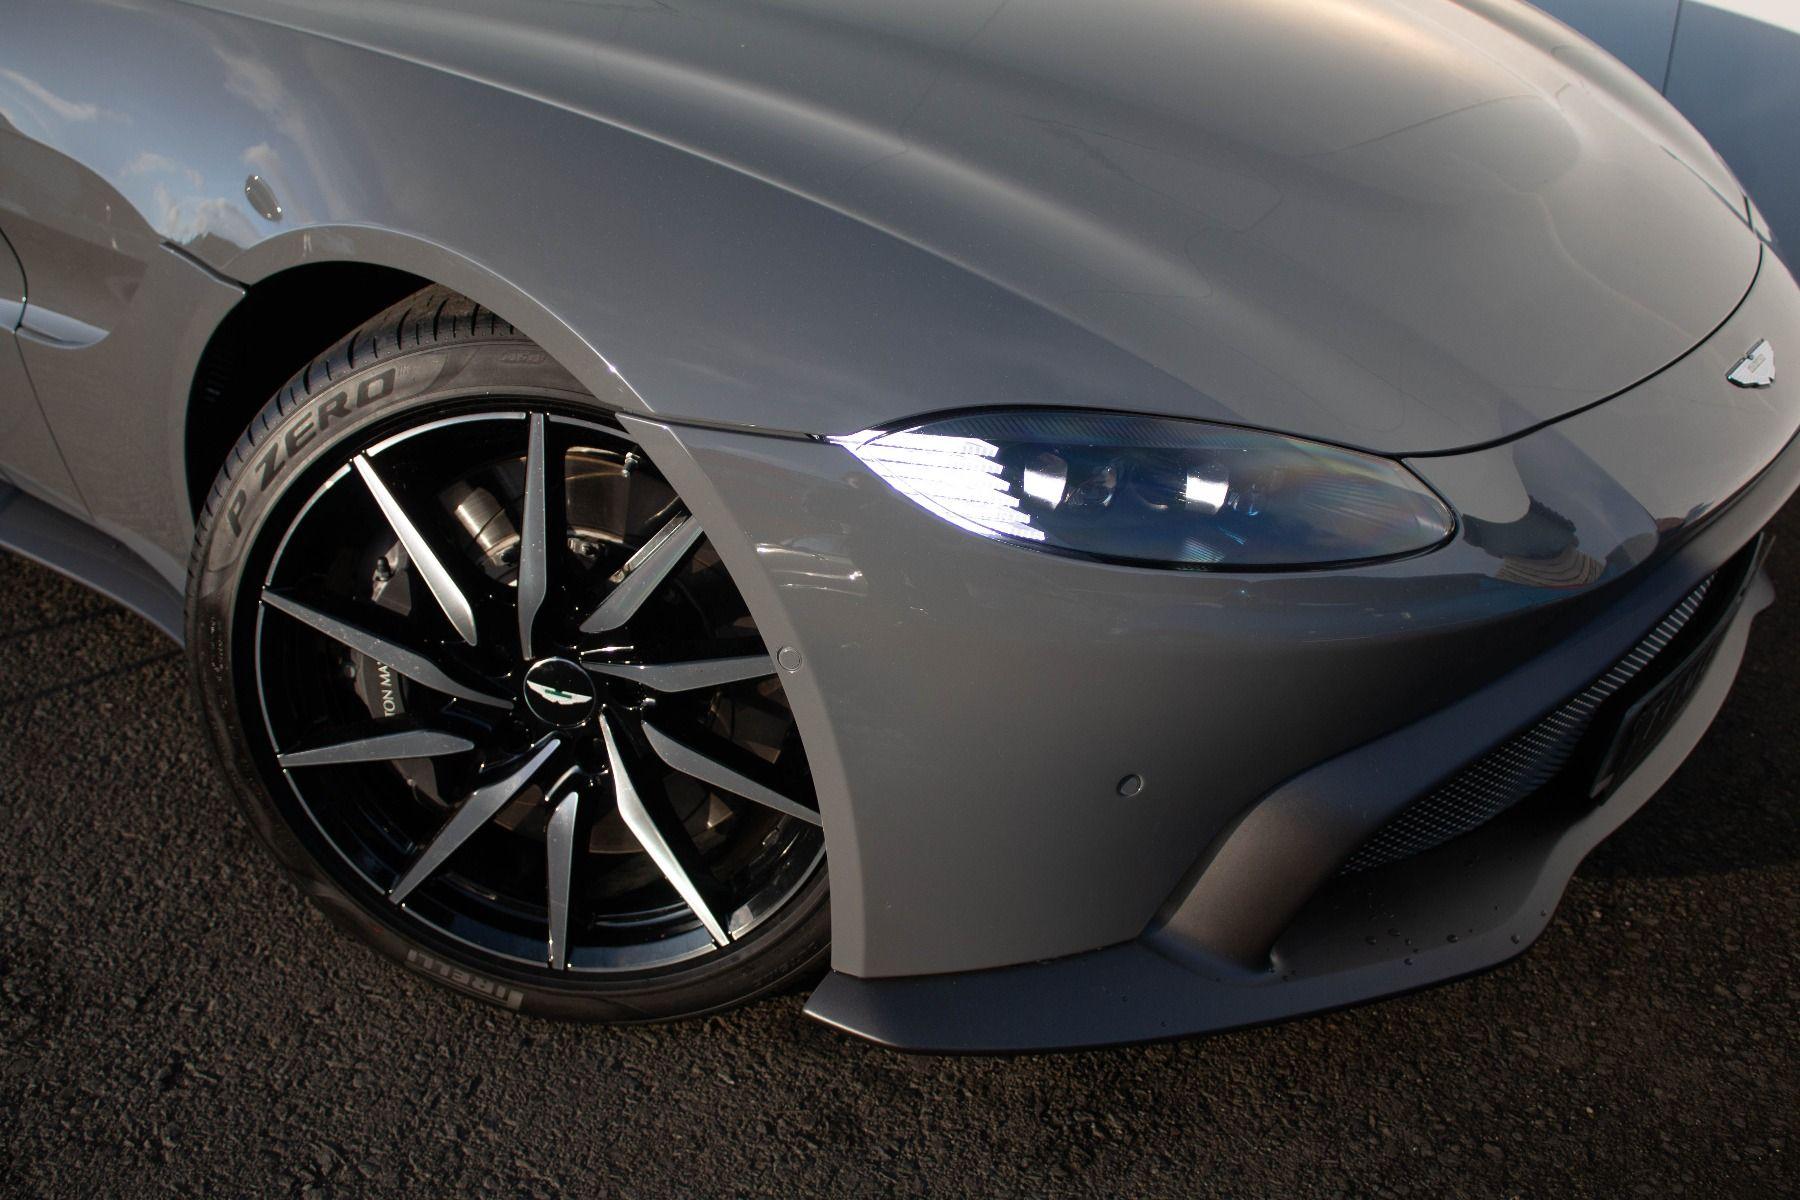 Aston Martin V8 Vantage Coupe 2dr ZF 8 Speed image 7